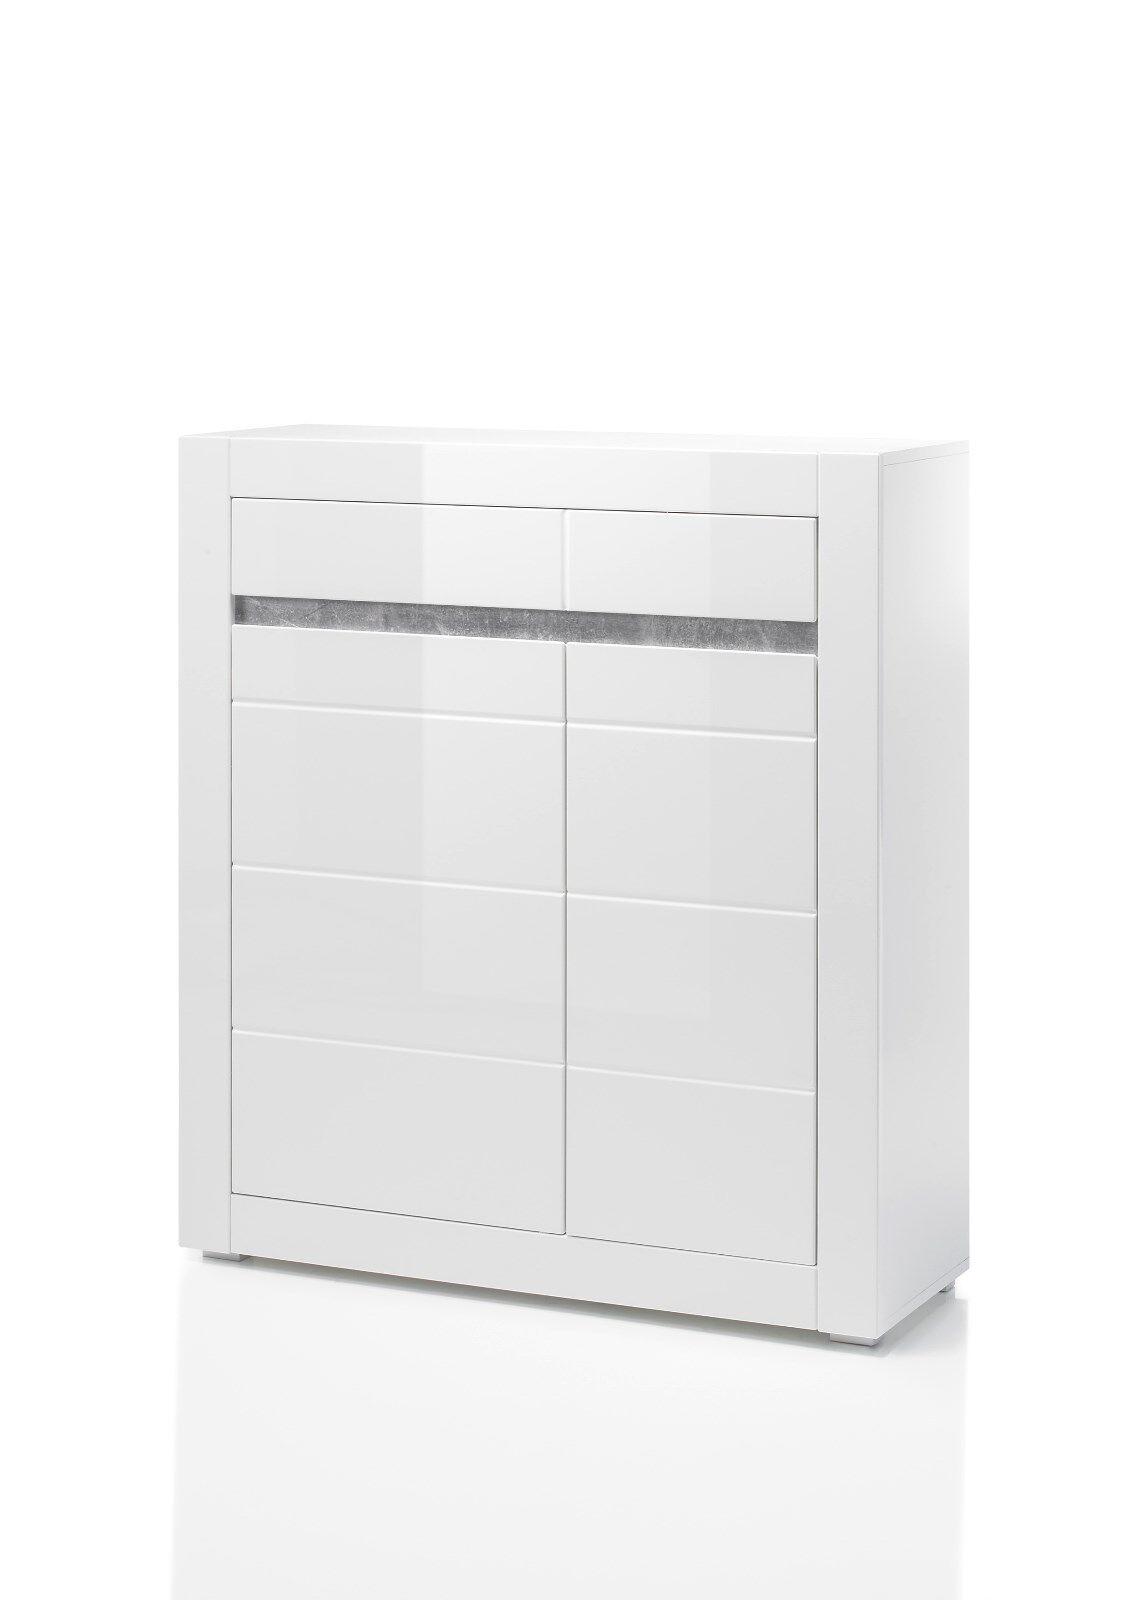 Kommode Sideboard Stauraumelement Carat 42 42 42 Weiß Hochglanz Beton 37fe1e